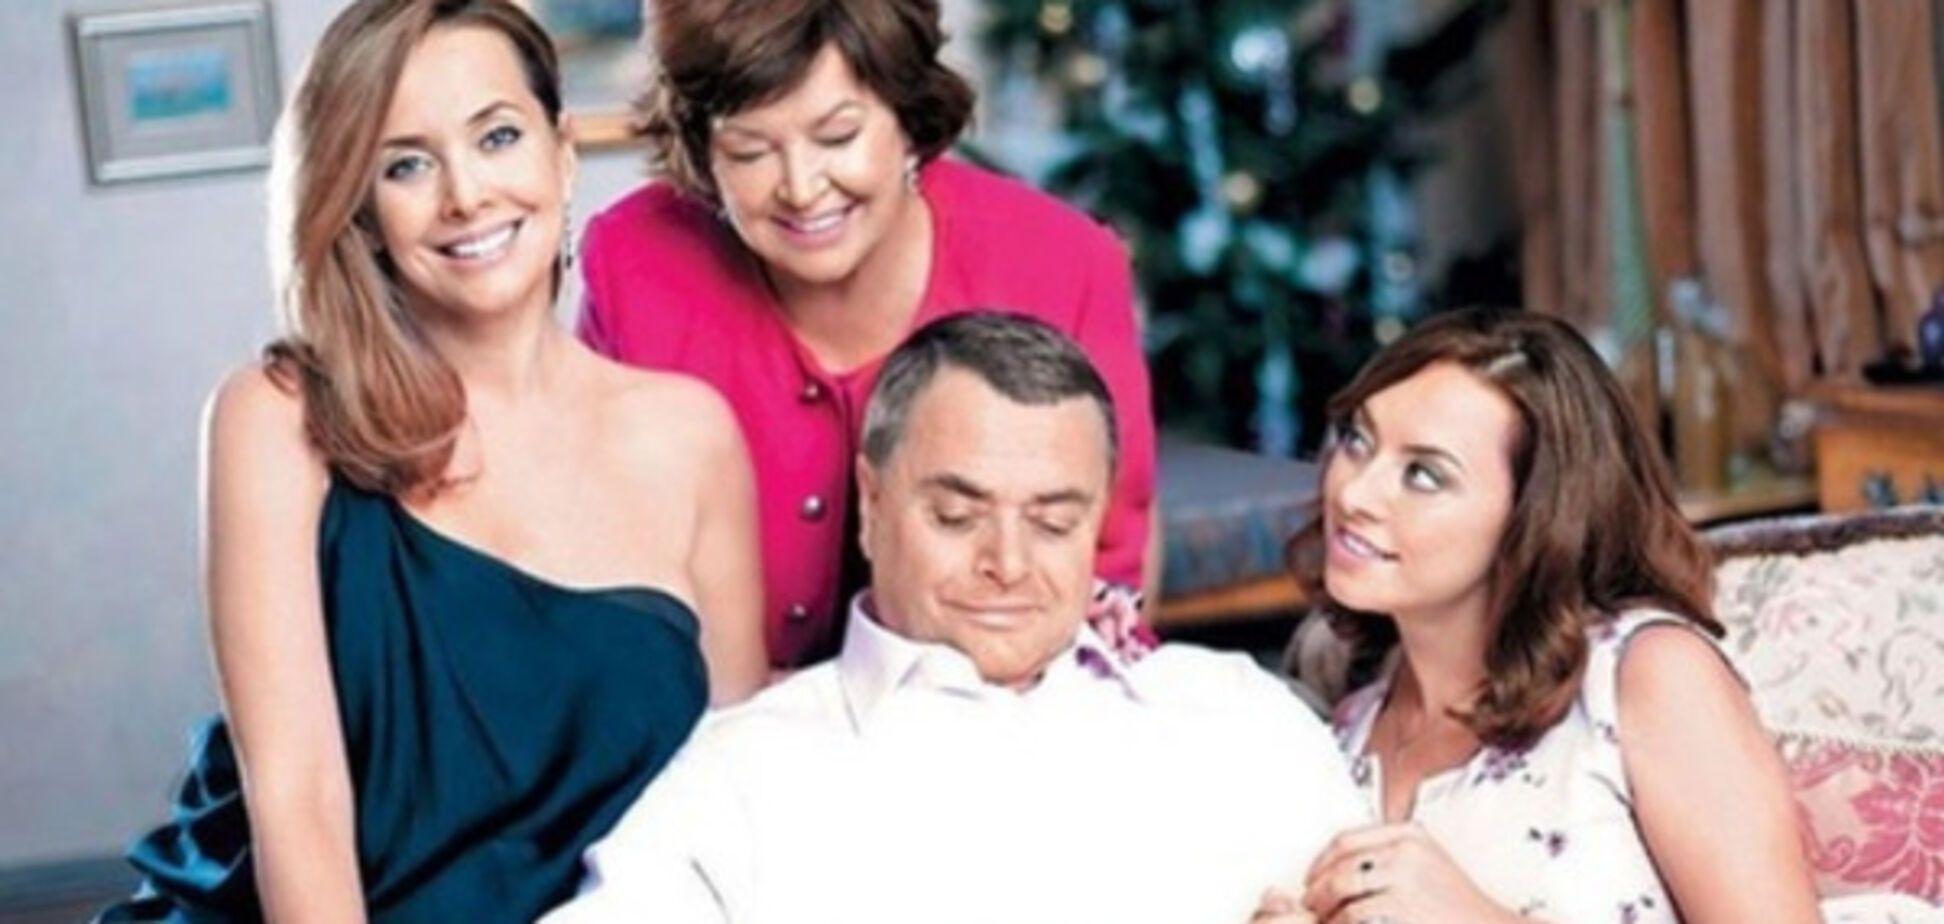 Суд обязал семью Фриске вернуть огромную сумму